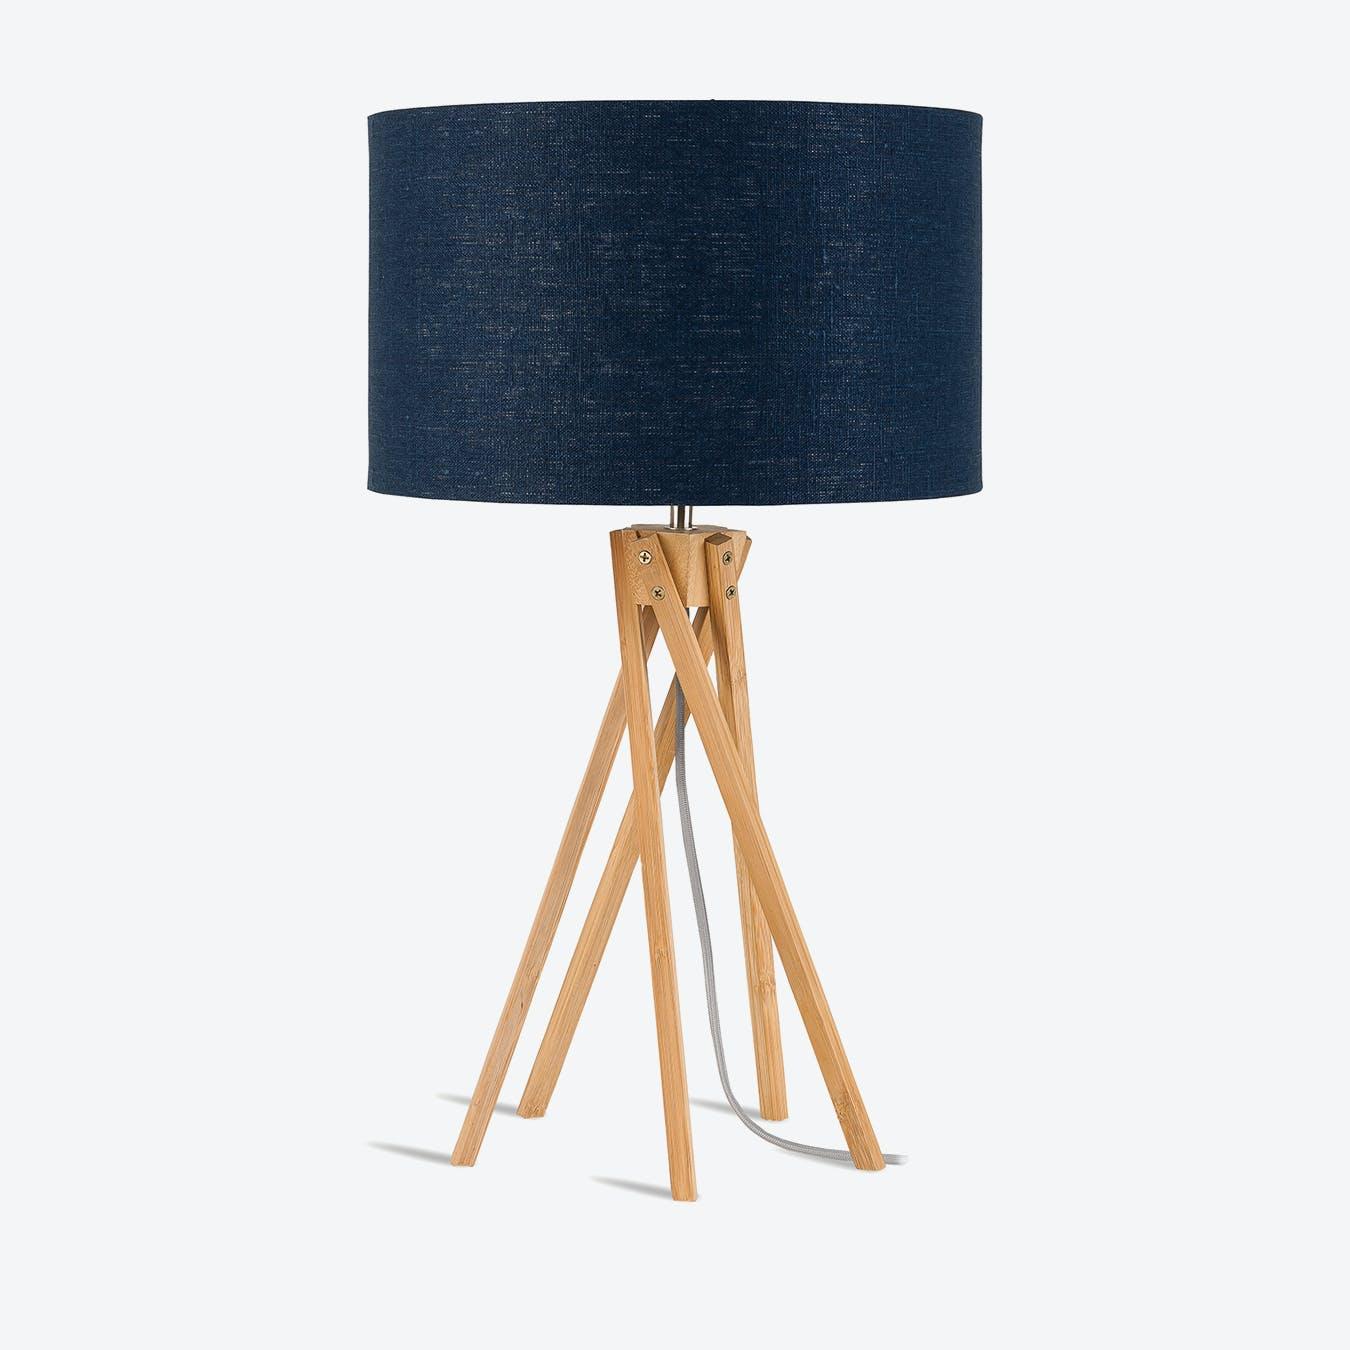 Kilimanjaro Table Lamp - Blue Denim